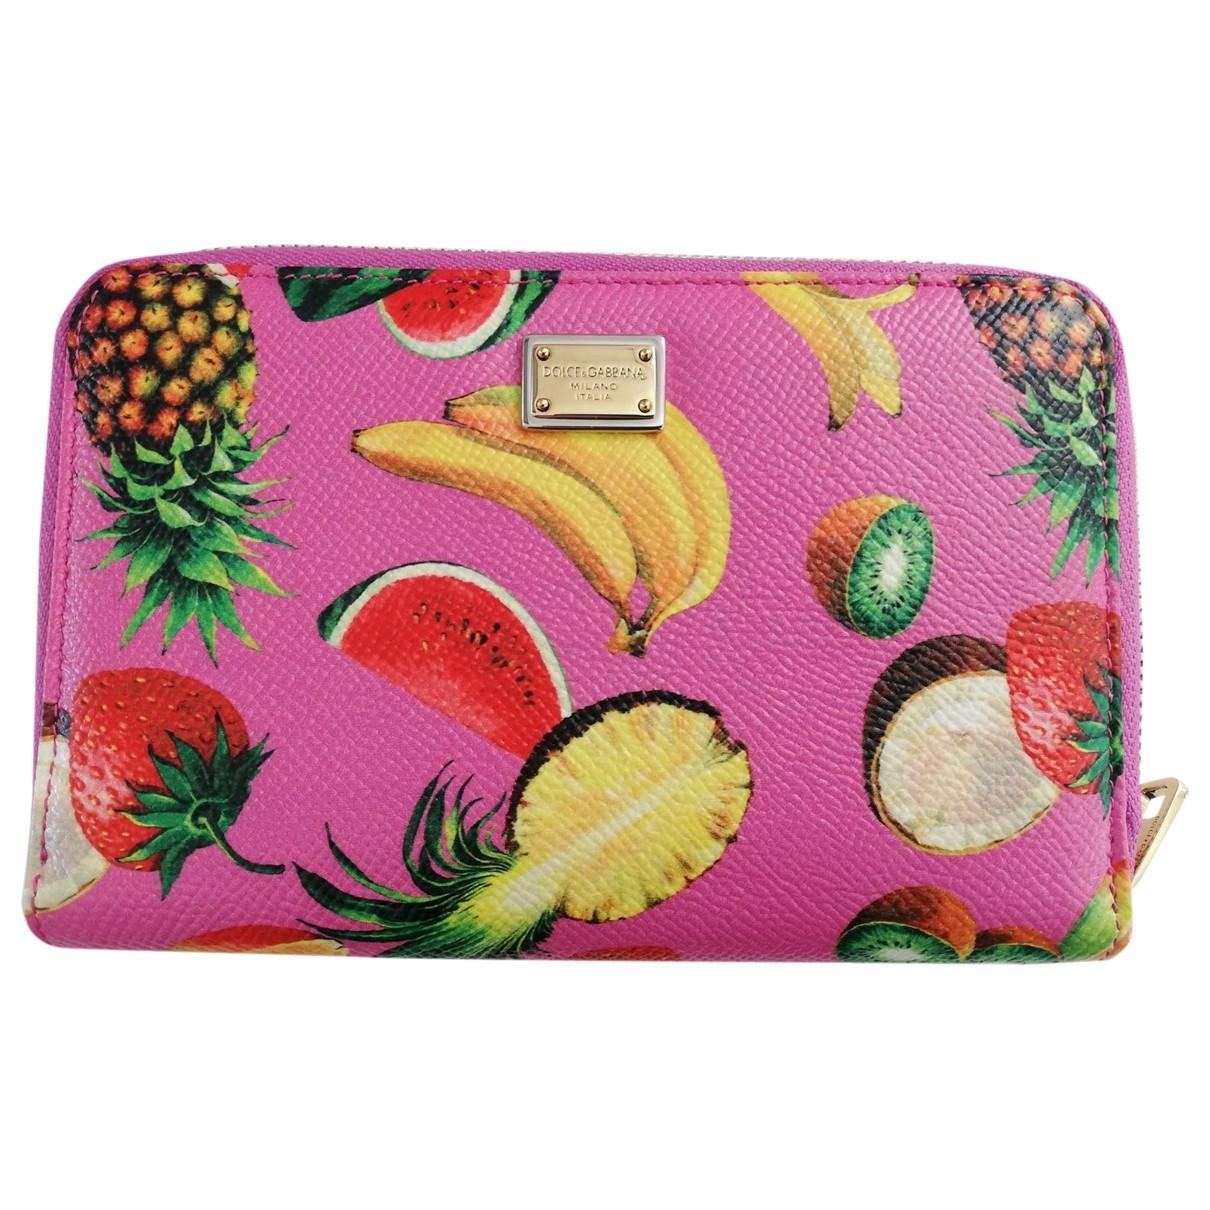 Dolce & Gabbana \N Multicolour Leather wallet for Women \N